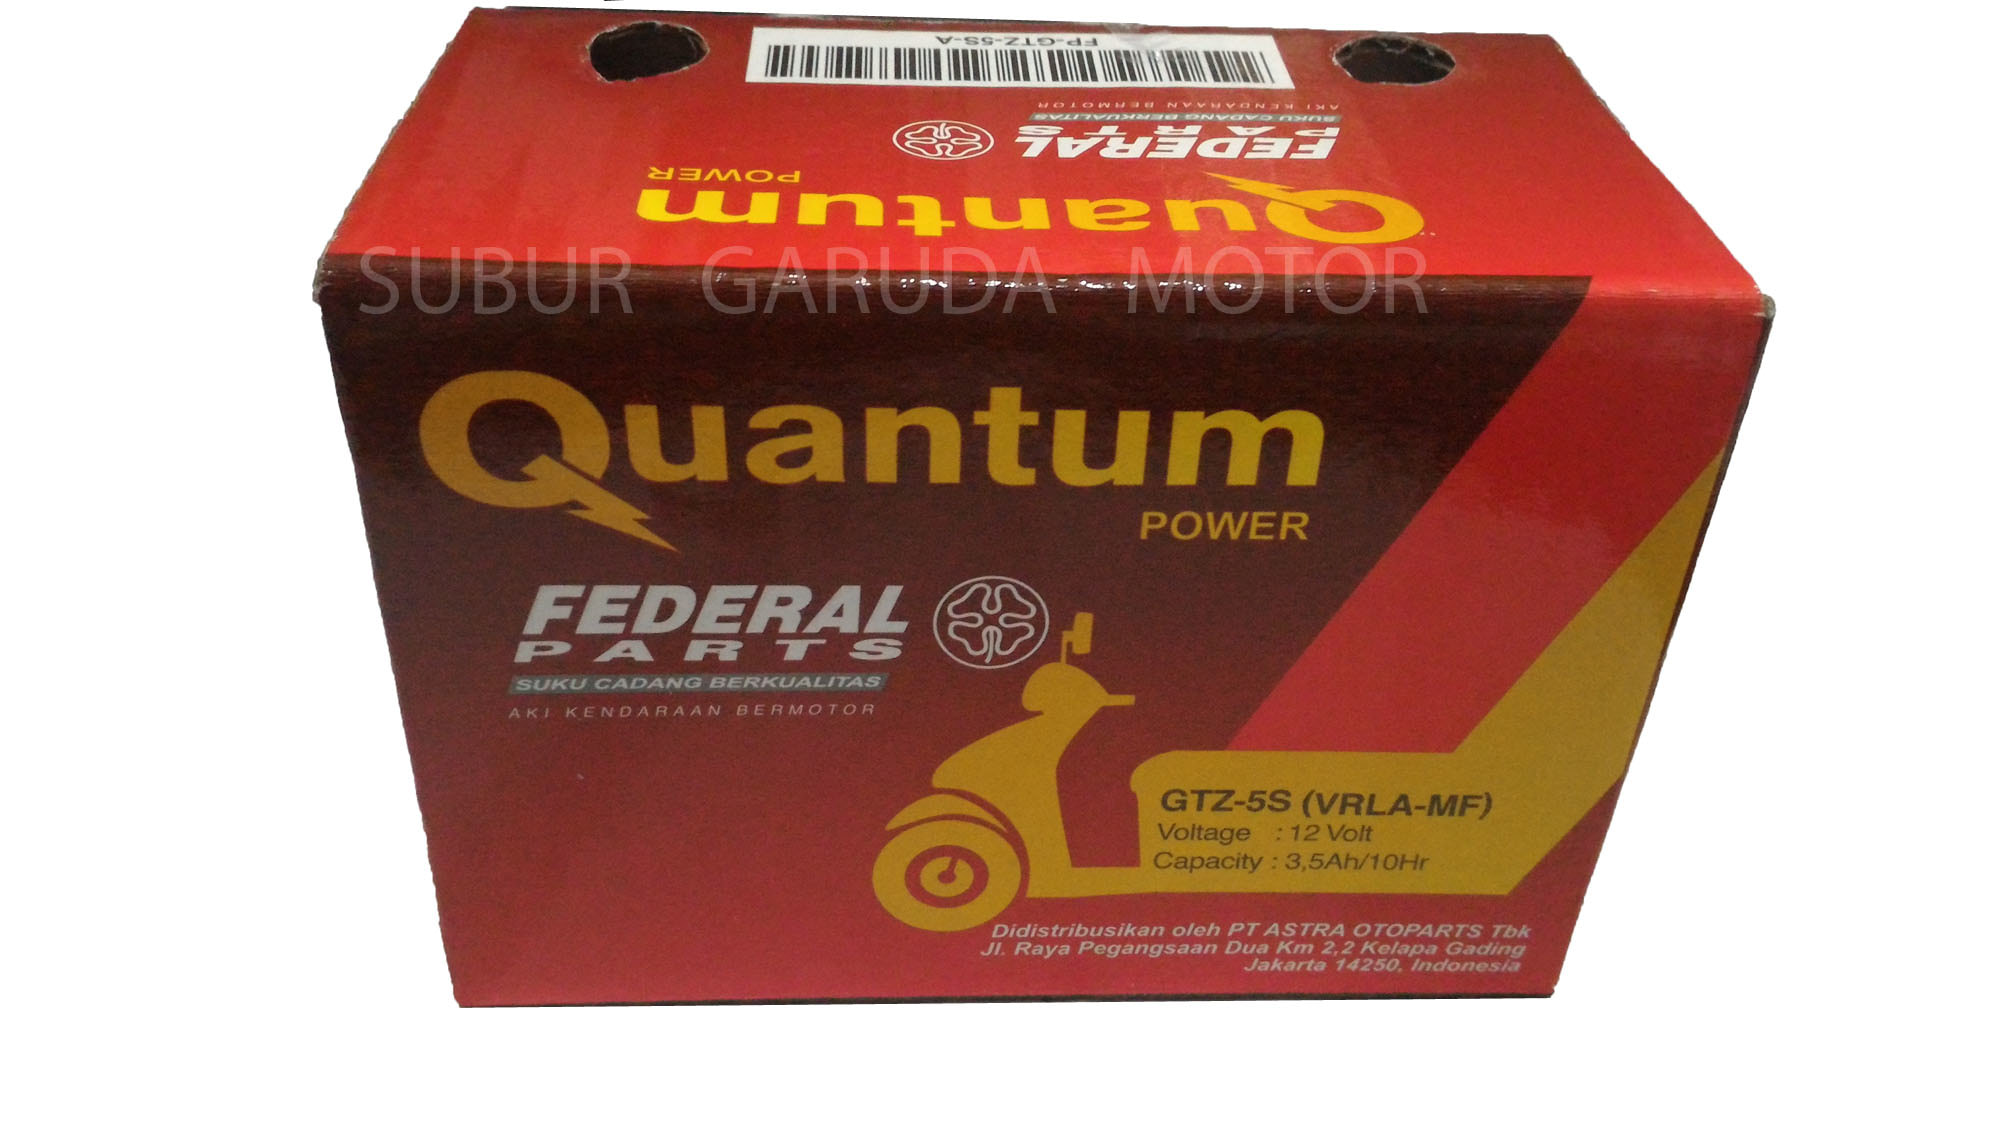 Jual Aki Kering Federal Quantum Power Gtz 5s Vrla Mf Vario Mio Accu Untuk Motor Supra Satria F Beat Garuda Parts Tokopedia